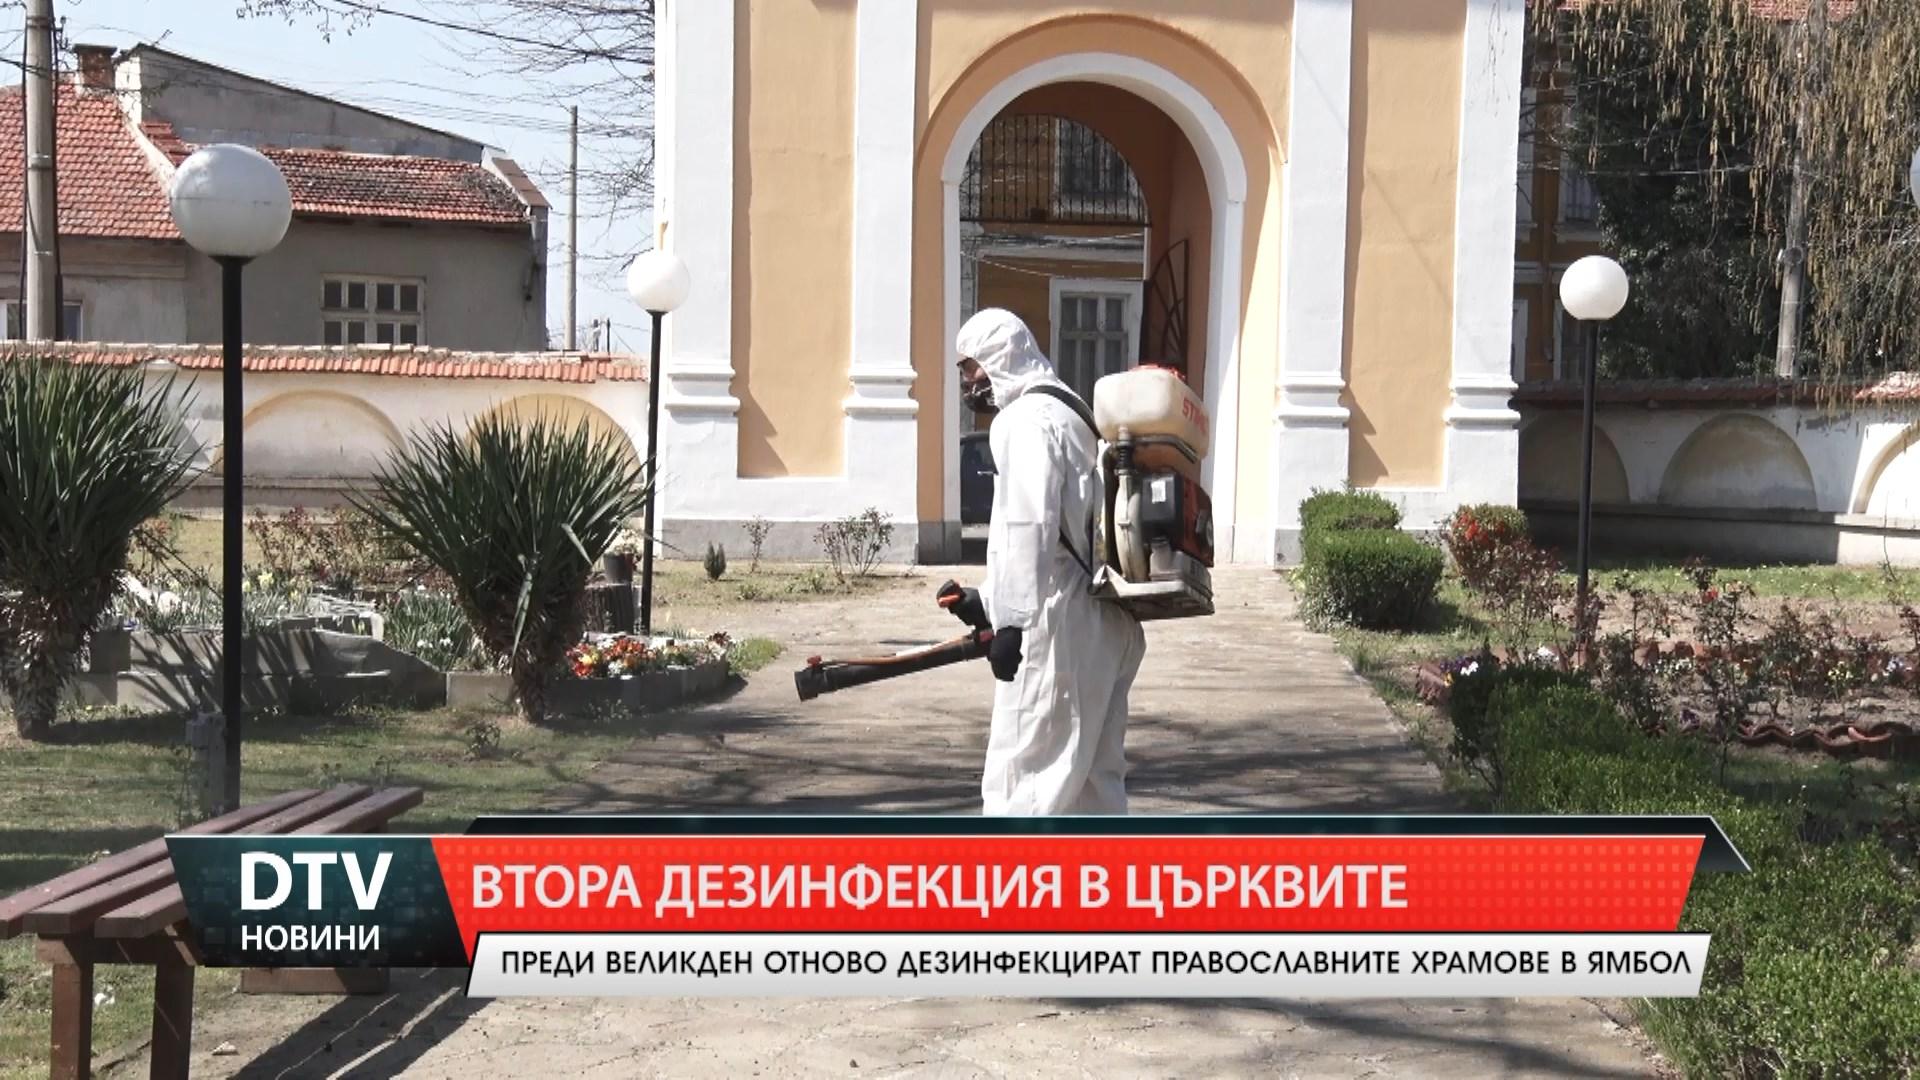 Втора дезинфекция в църквите